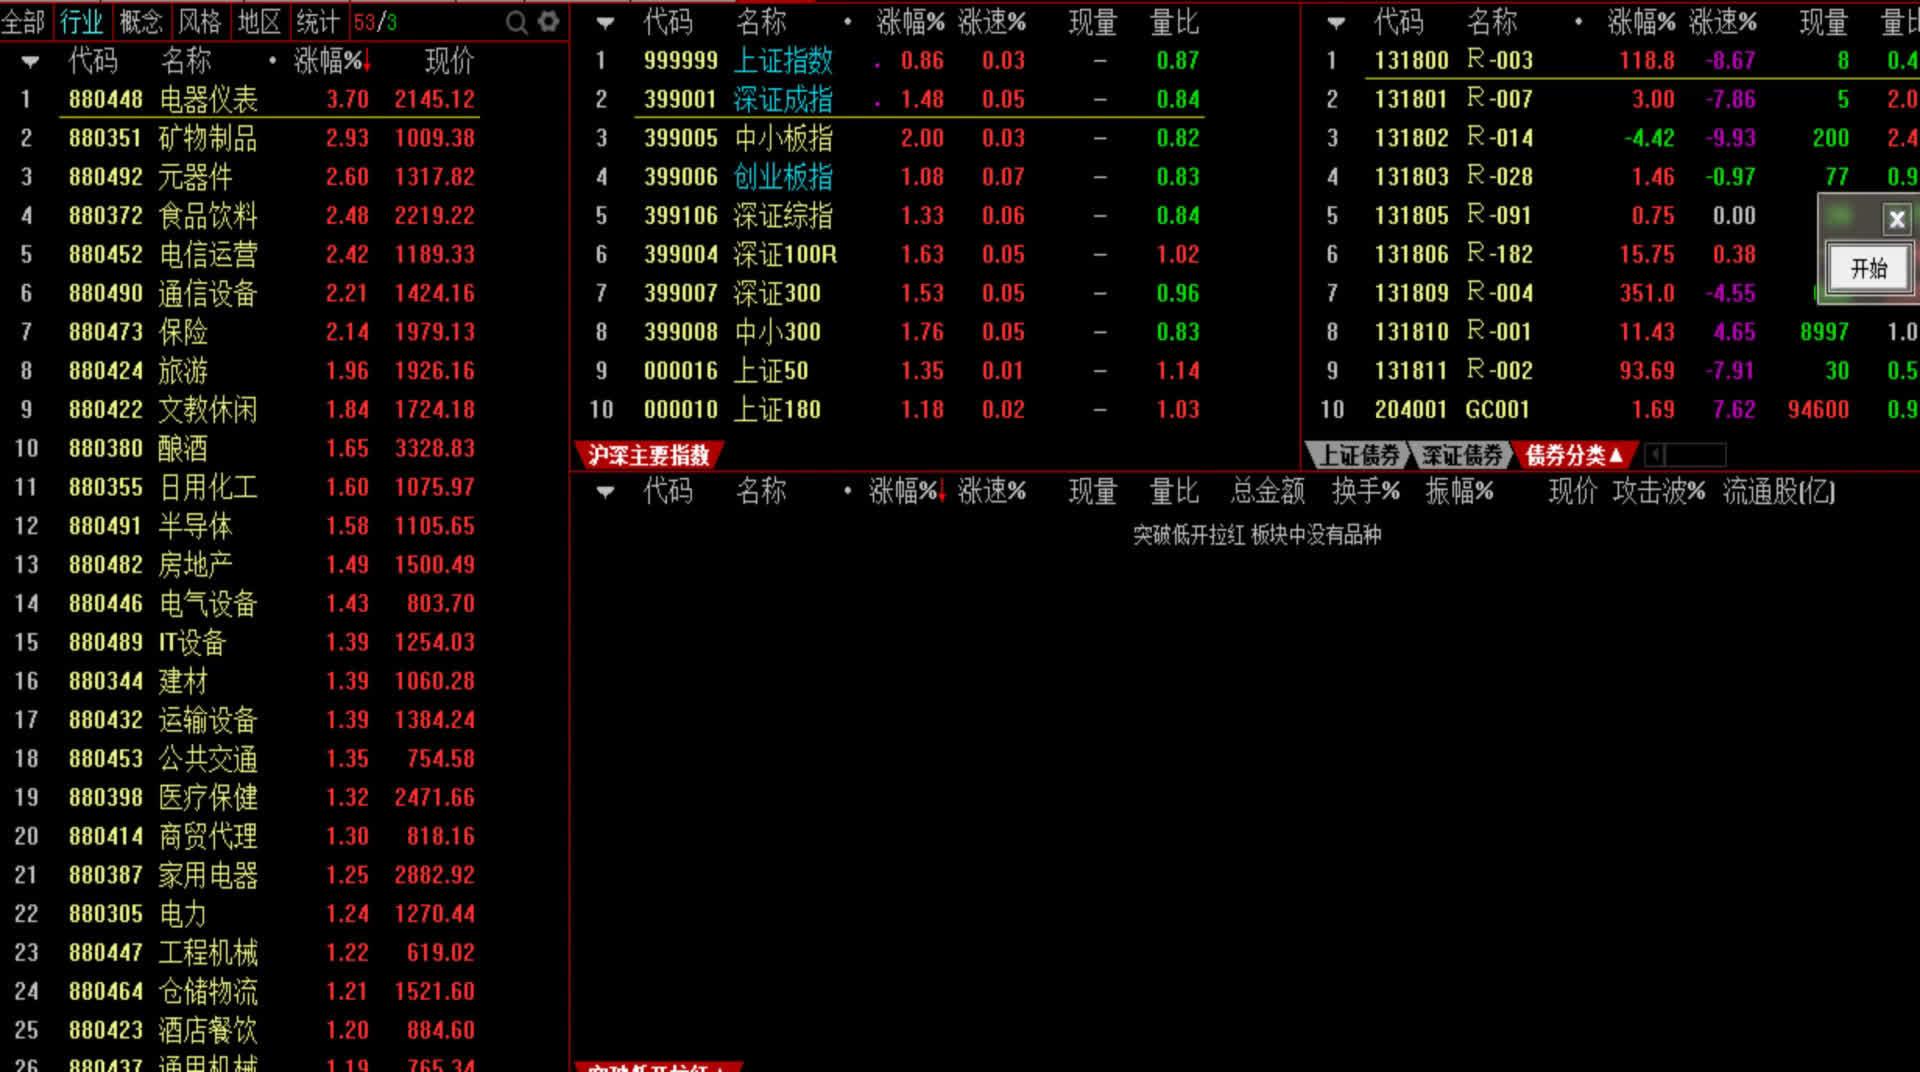 A股收评(上)上证指数涨逾0.89%受5日线压制,明天会怎么走?